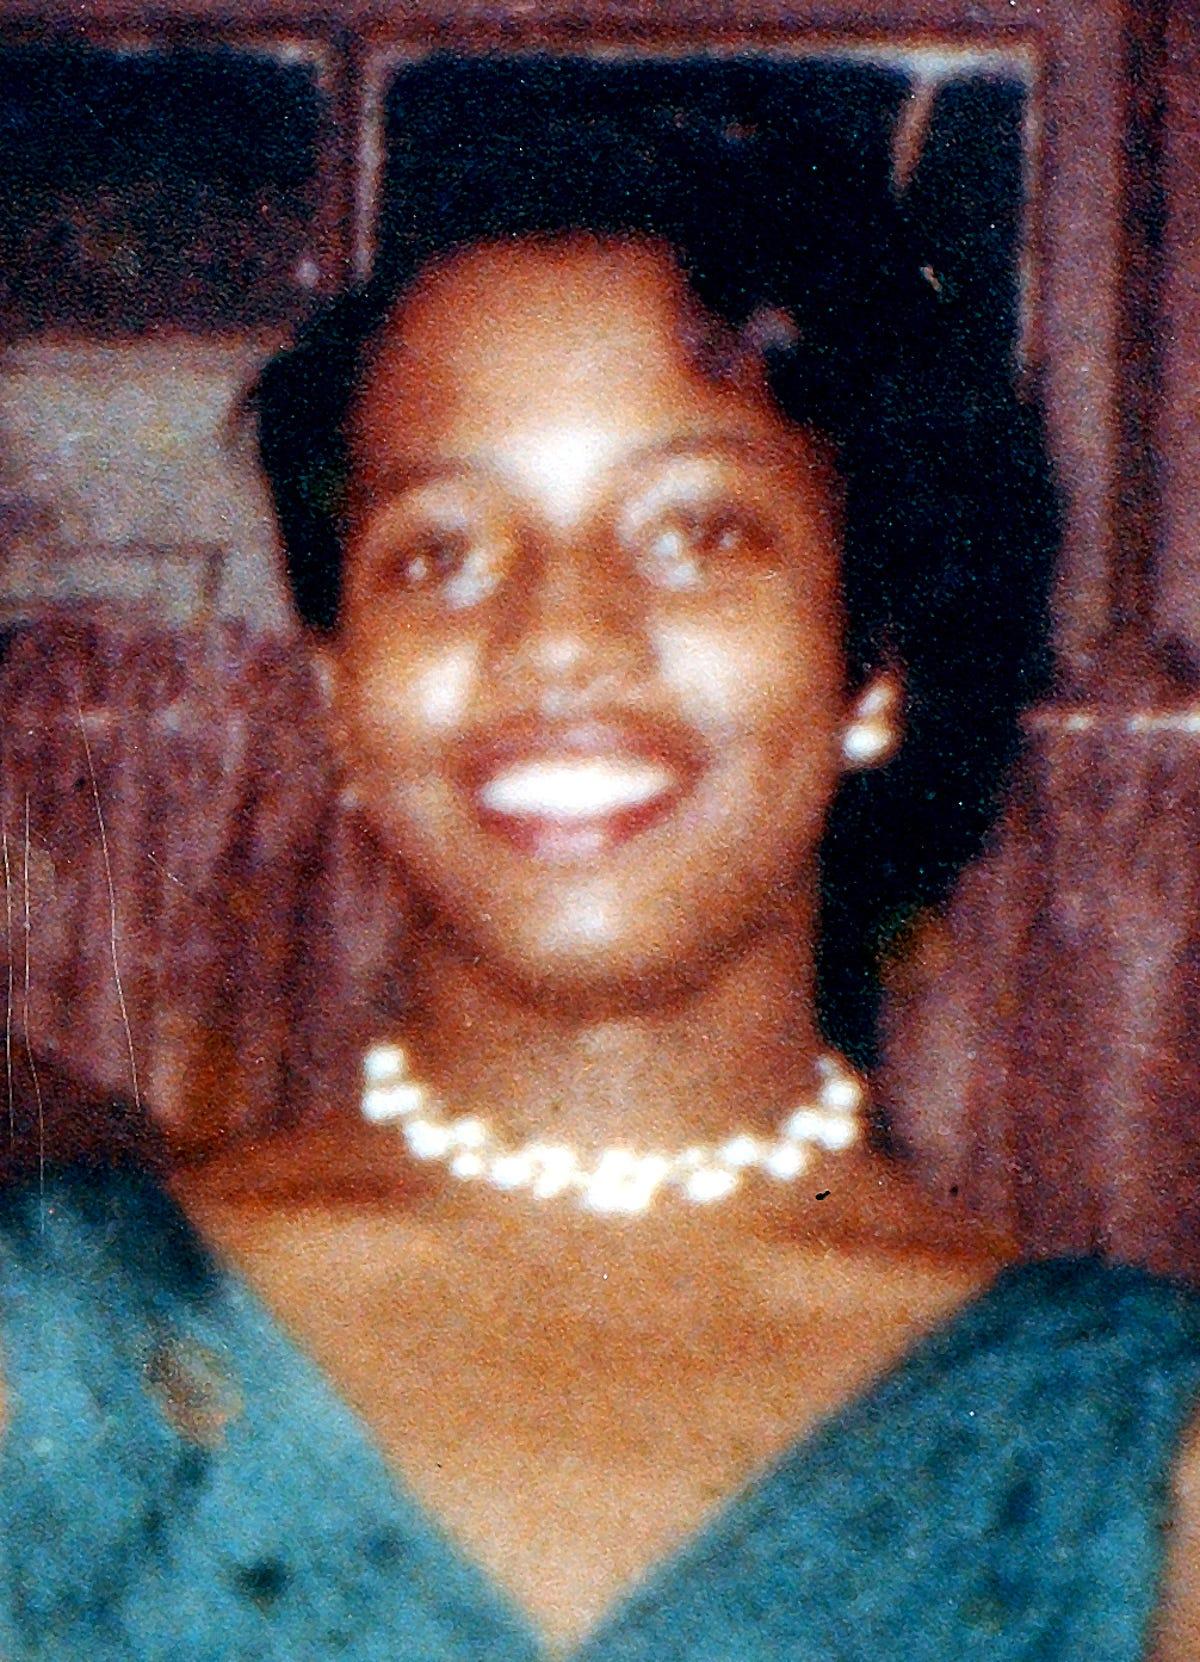 1969 York, Pa  race riots: The murder of Lillie Belle Allen